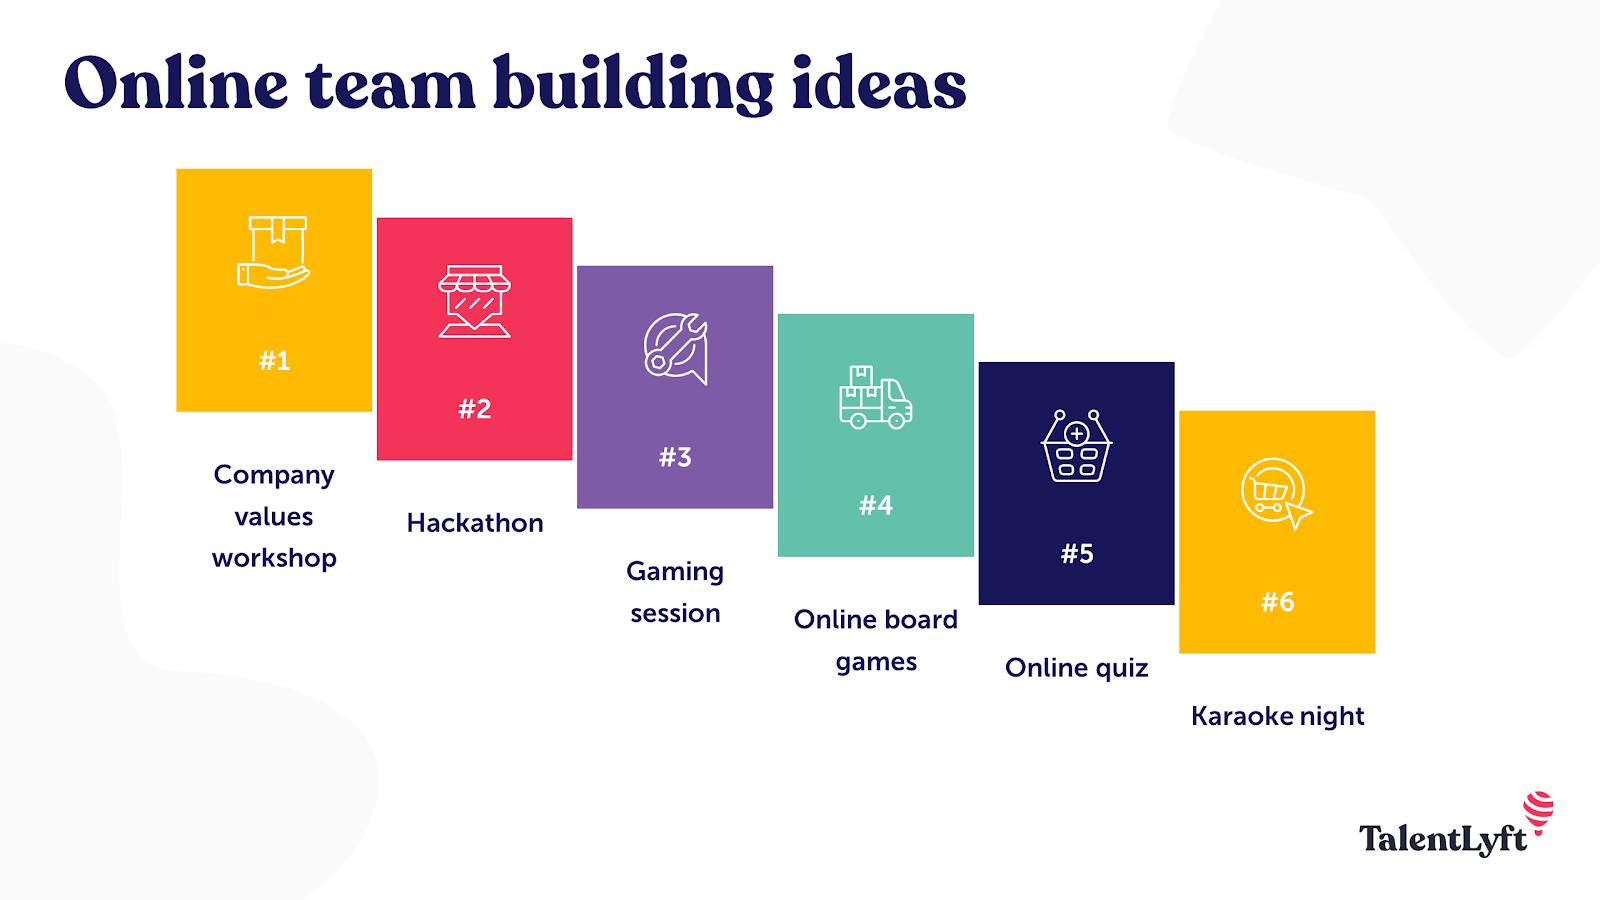 Online team building ideas